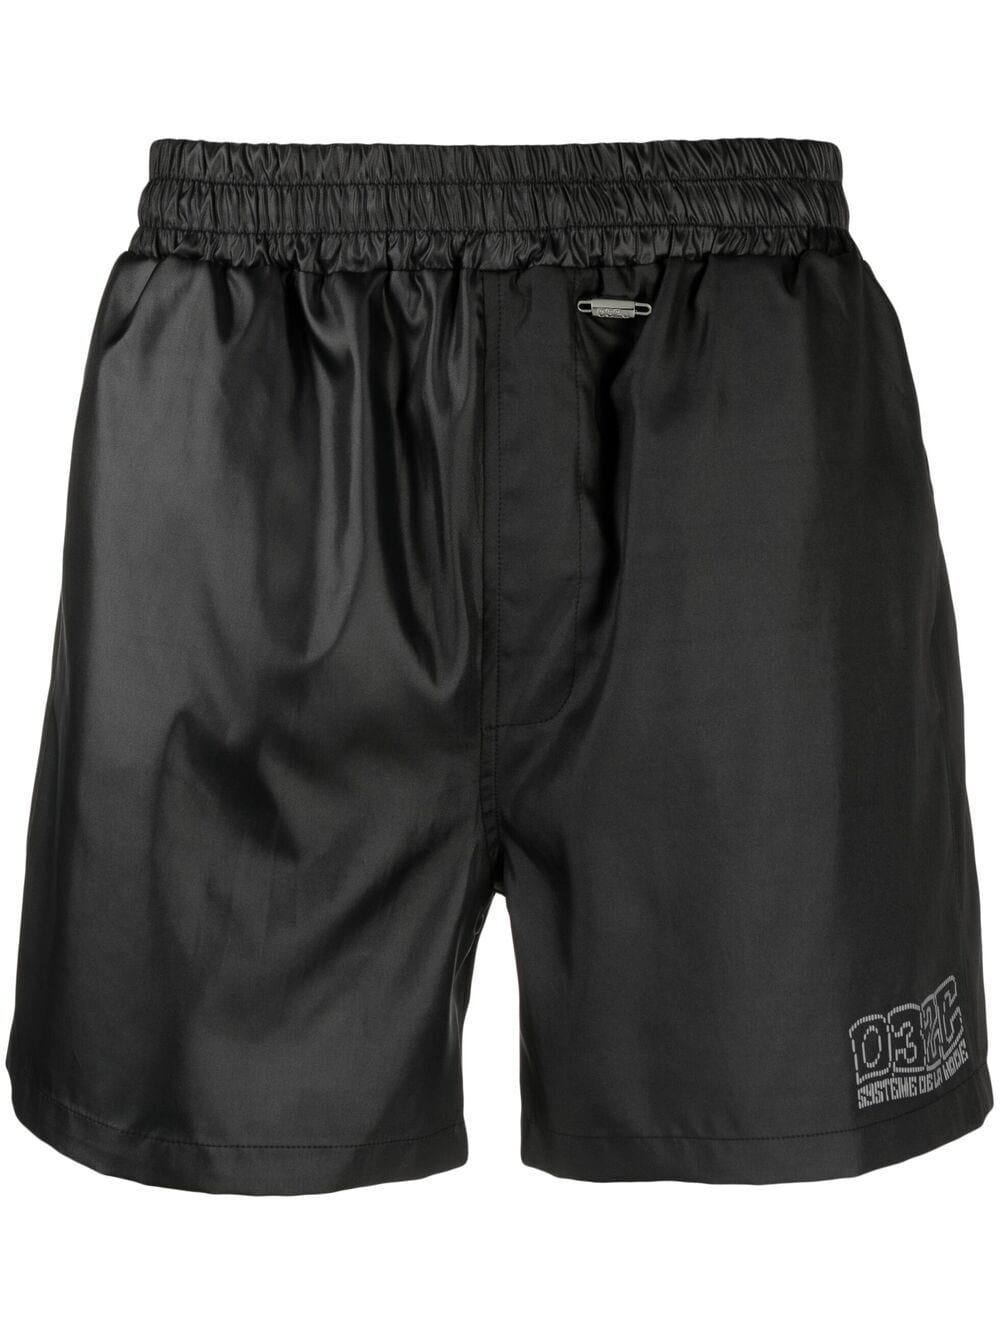 032c logo embroidered shorts man black 032c | Shorts | SS21-W-2030BLACK